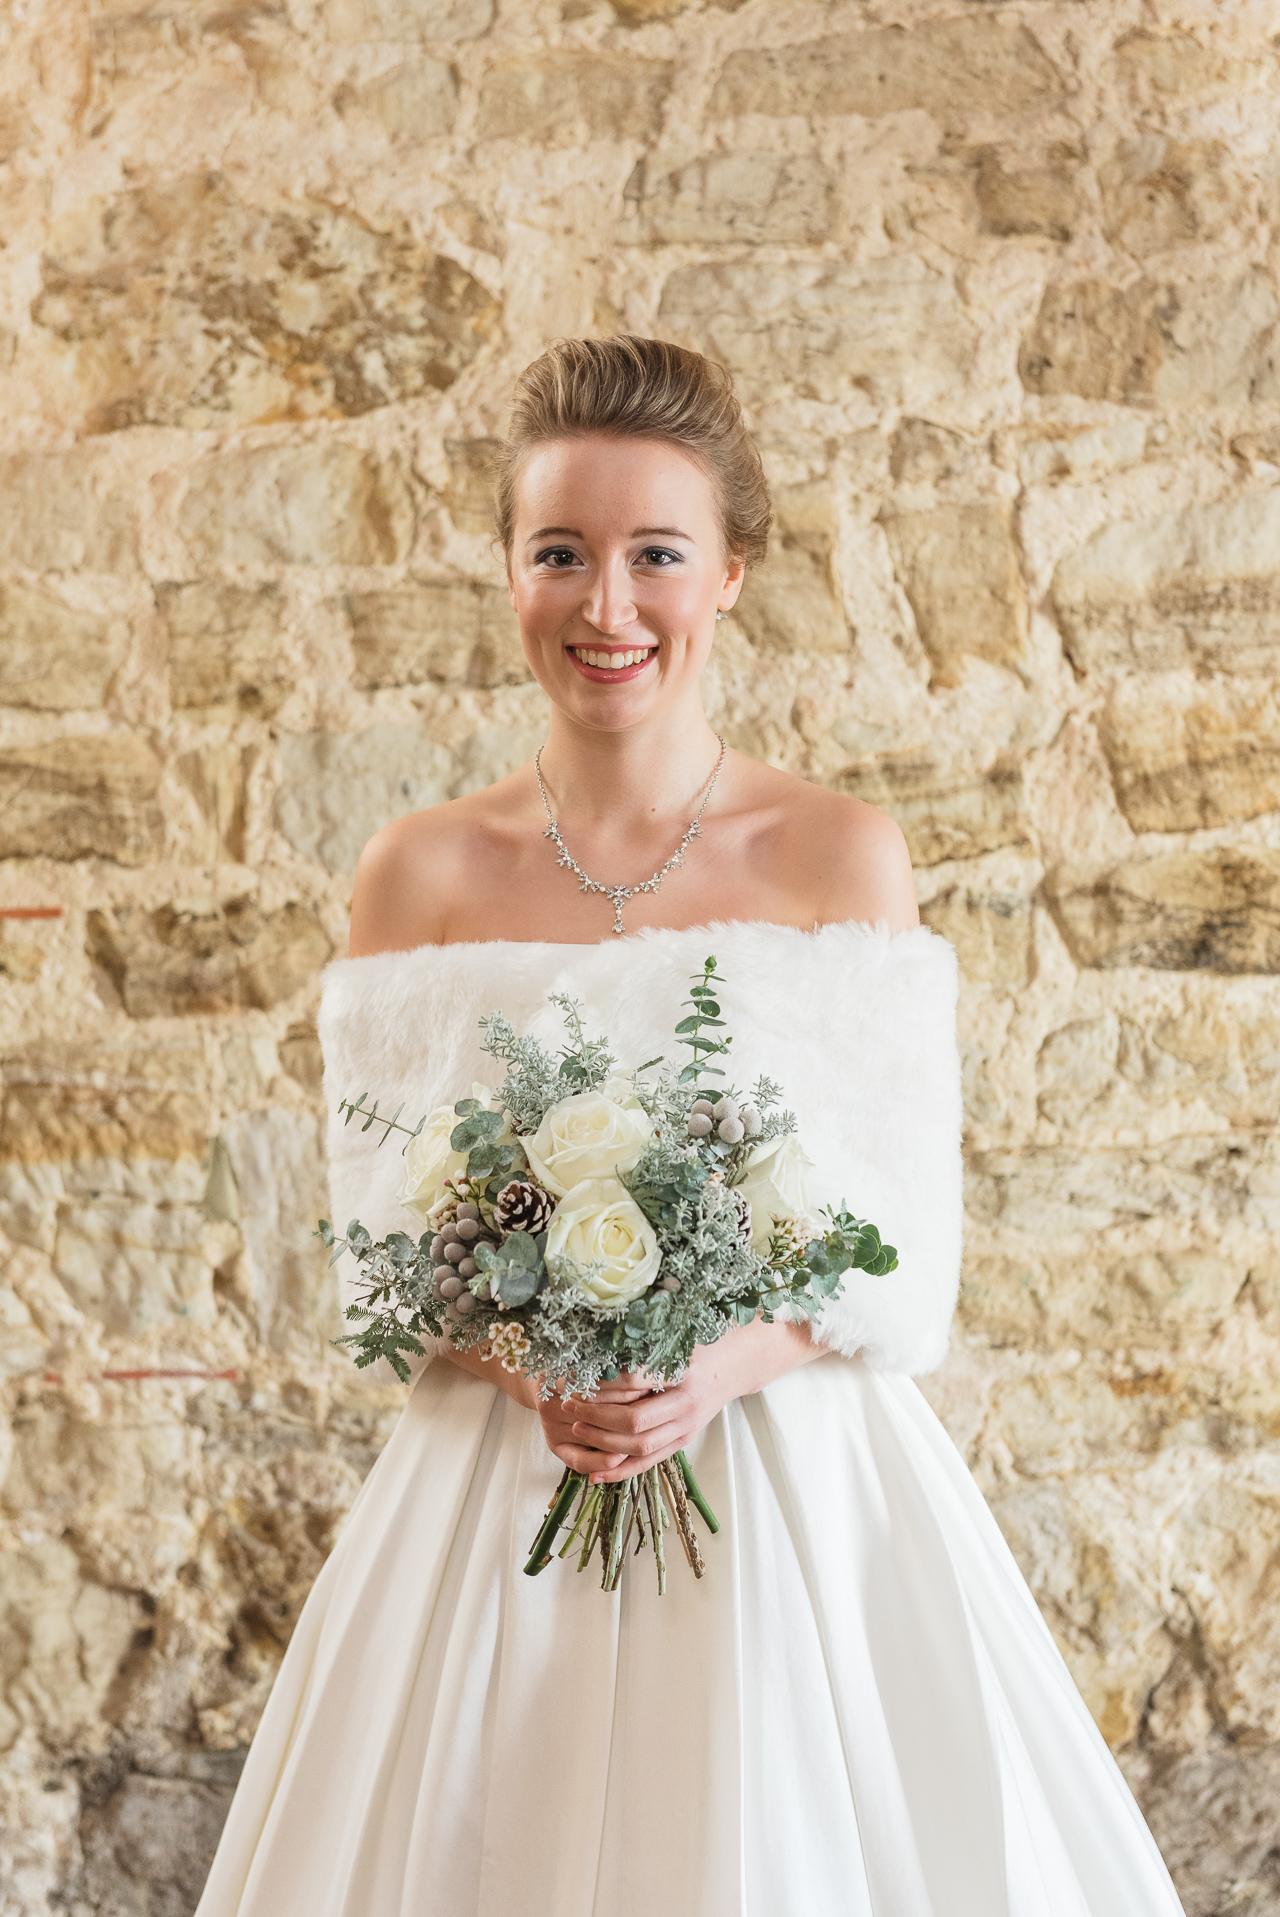 Swallows Oast Ticehurst Bridal Photo Shoot | Oakhouse Photography